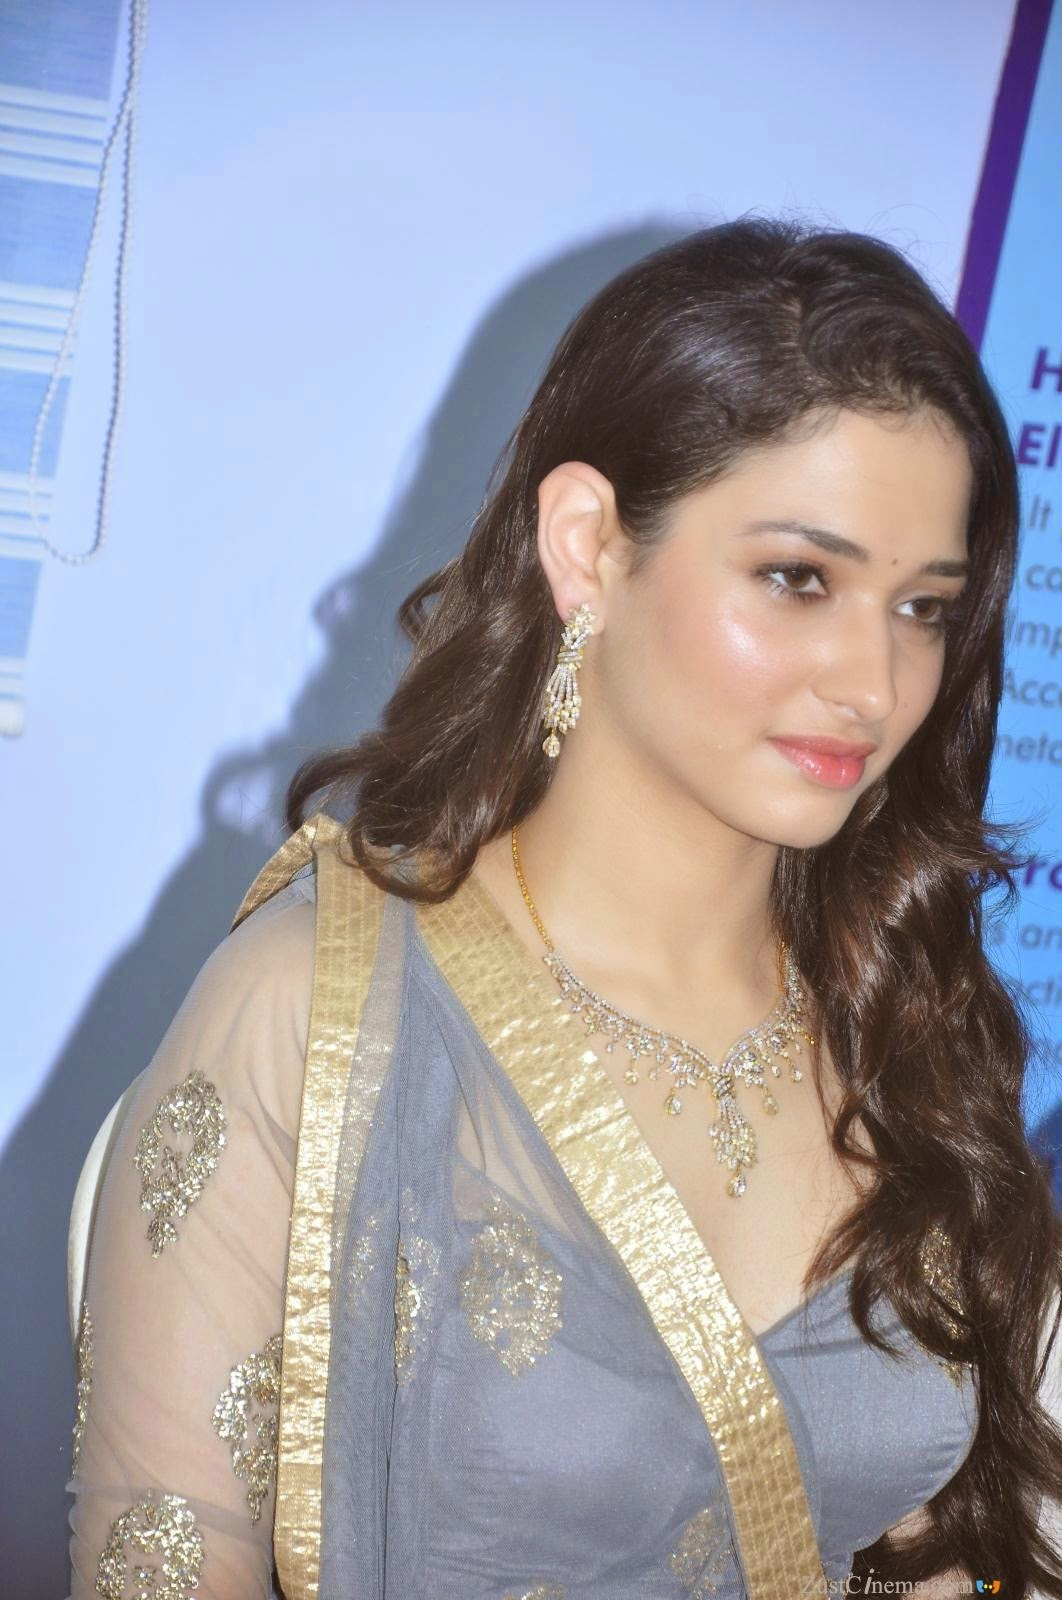 Tamannaah Bhatia Stills At Shop Opening In Blue Dress